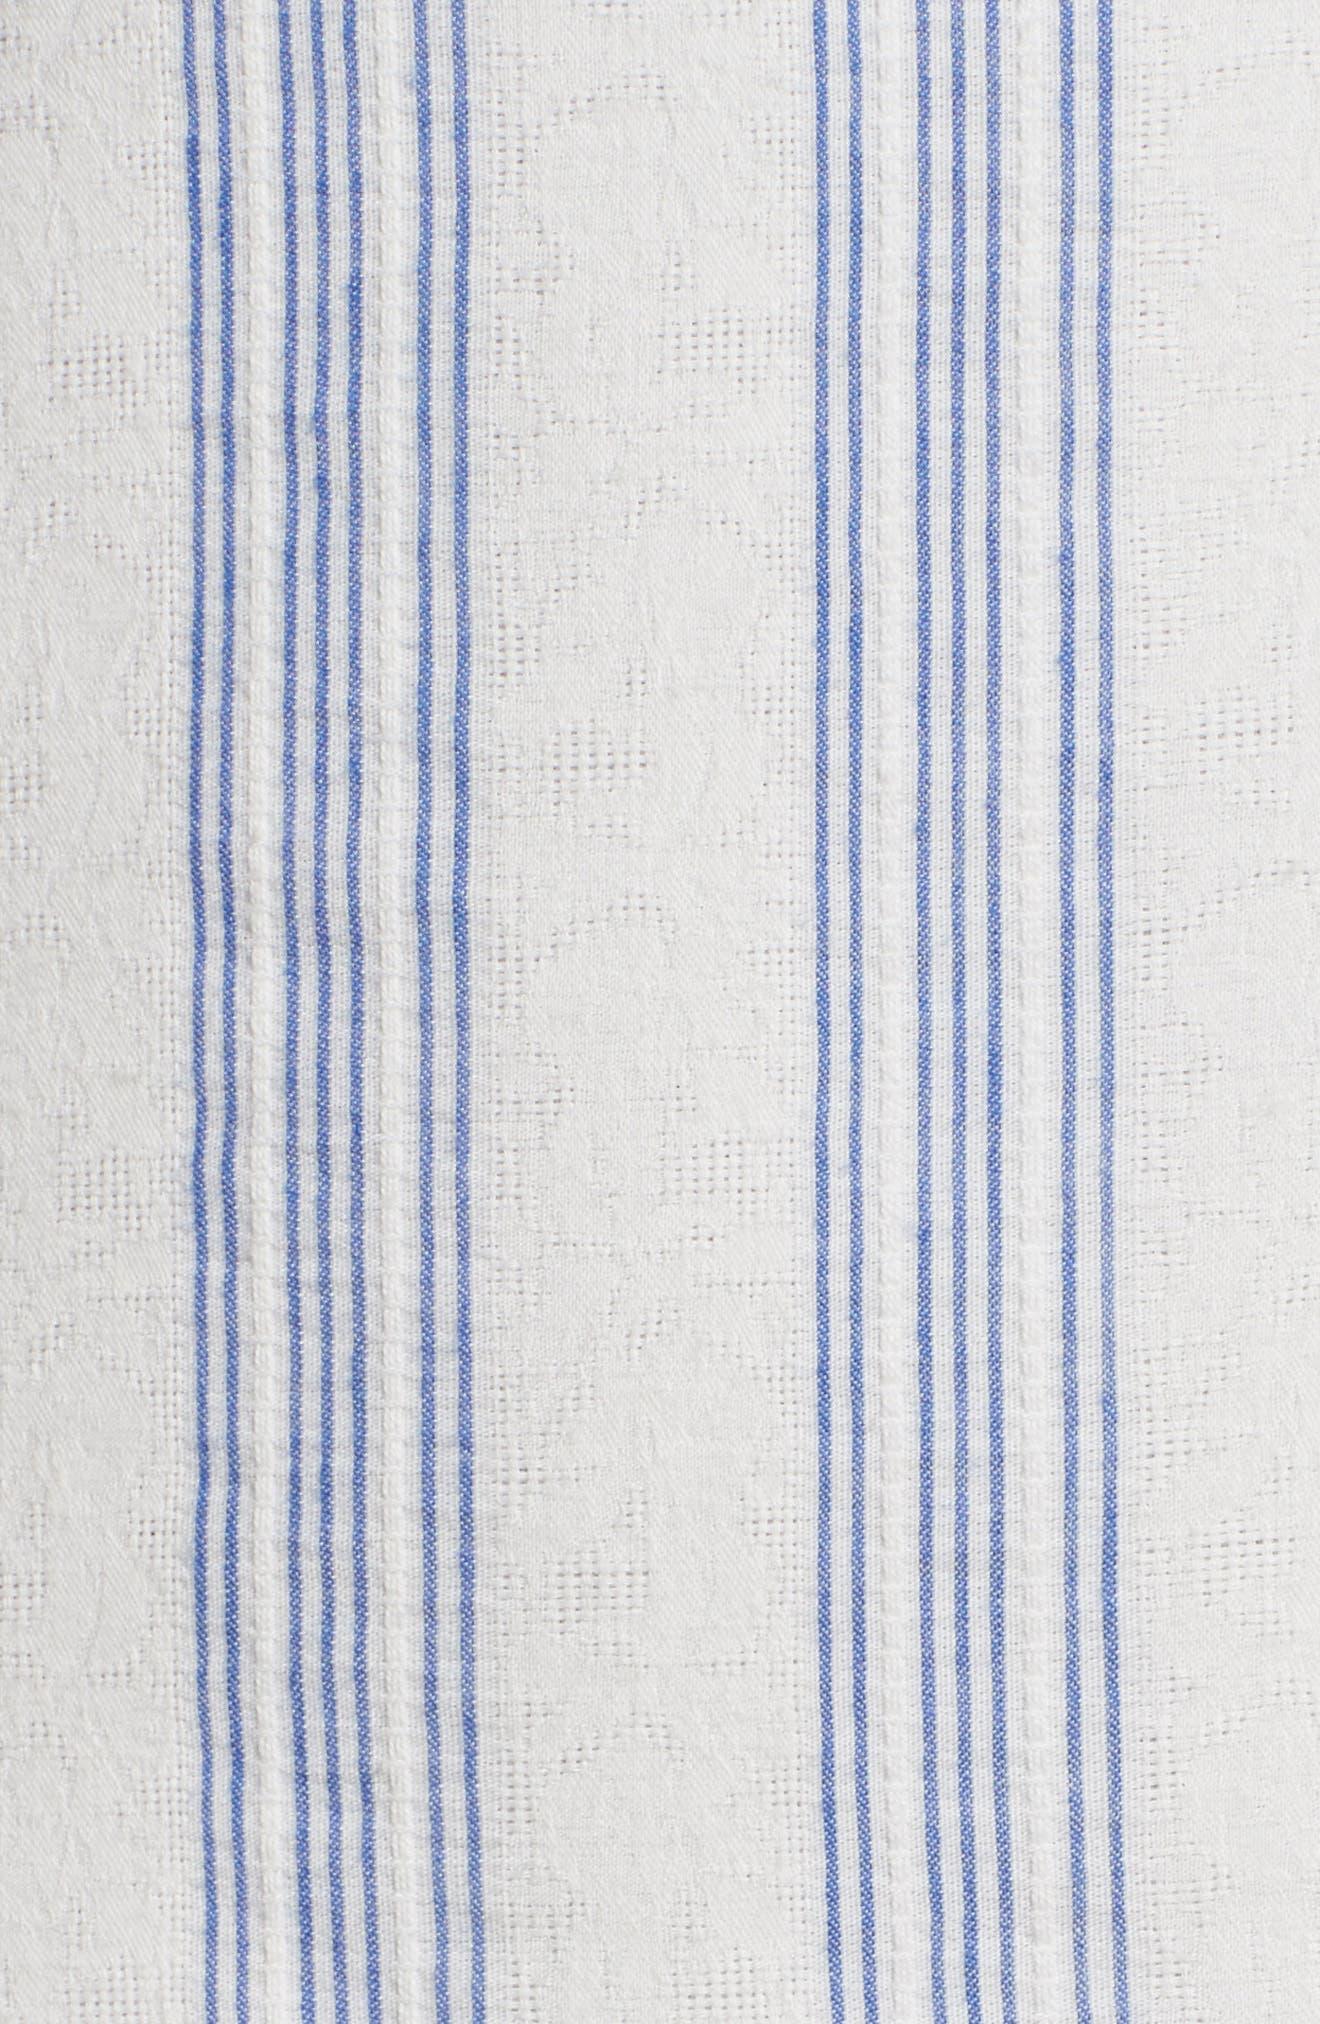 Stripe Ruffle Sheath Dress,                             Alternate thumbnail 5, color,                             100